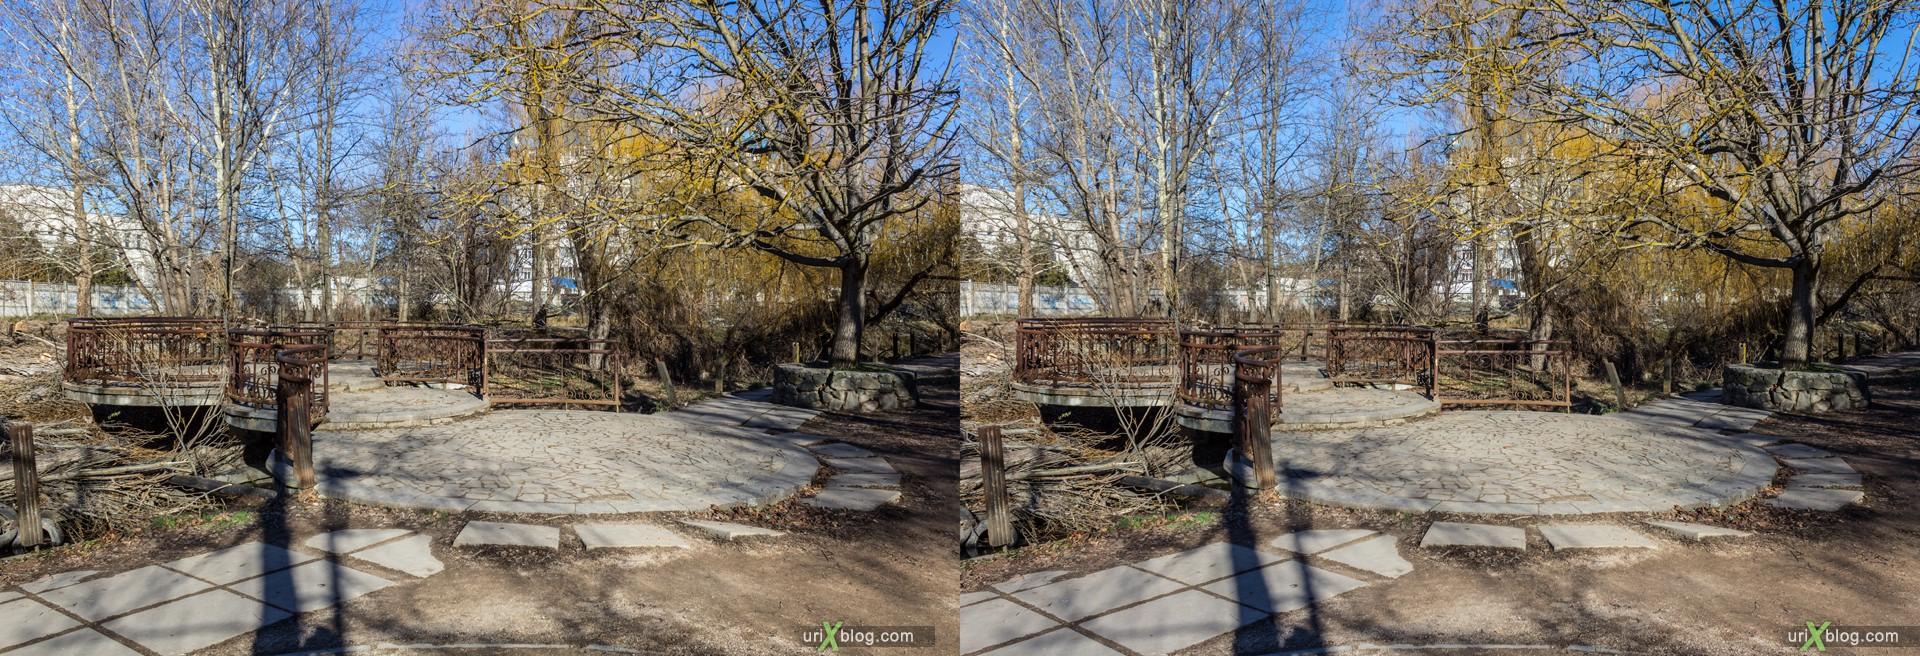 2012, bridge, Simferopol, Gagarin park, Crimea, Russia, Ukraine, winter, 3D, stereo pair, cross-eyed, crossview, cross view stereo pair, stereoscopic